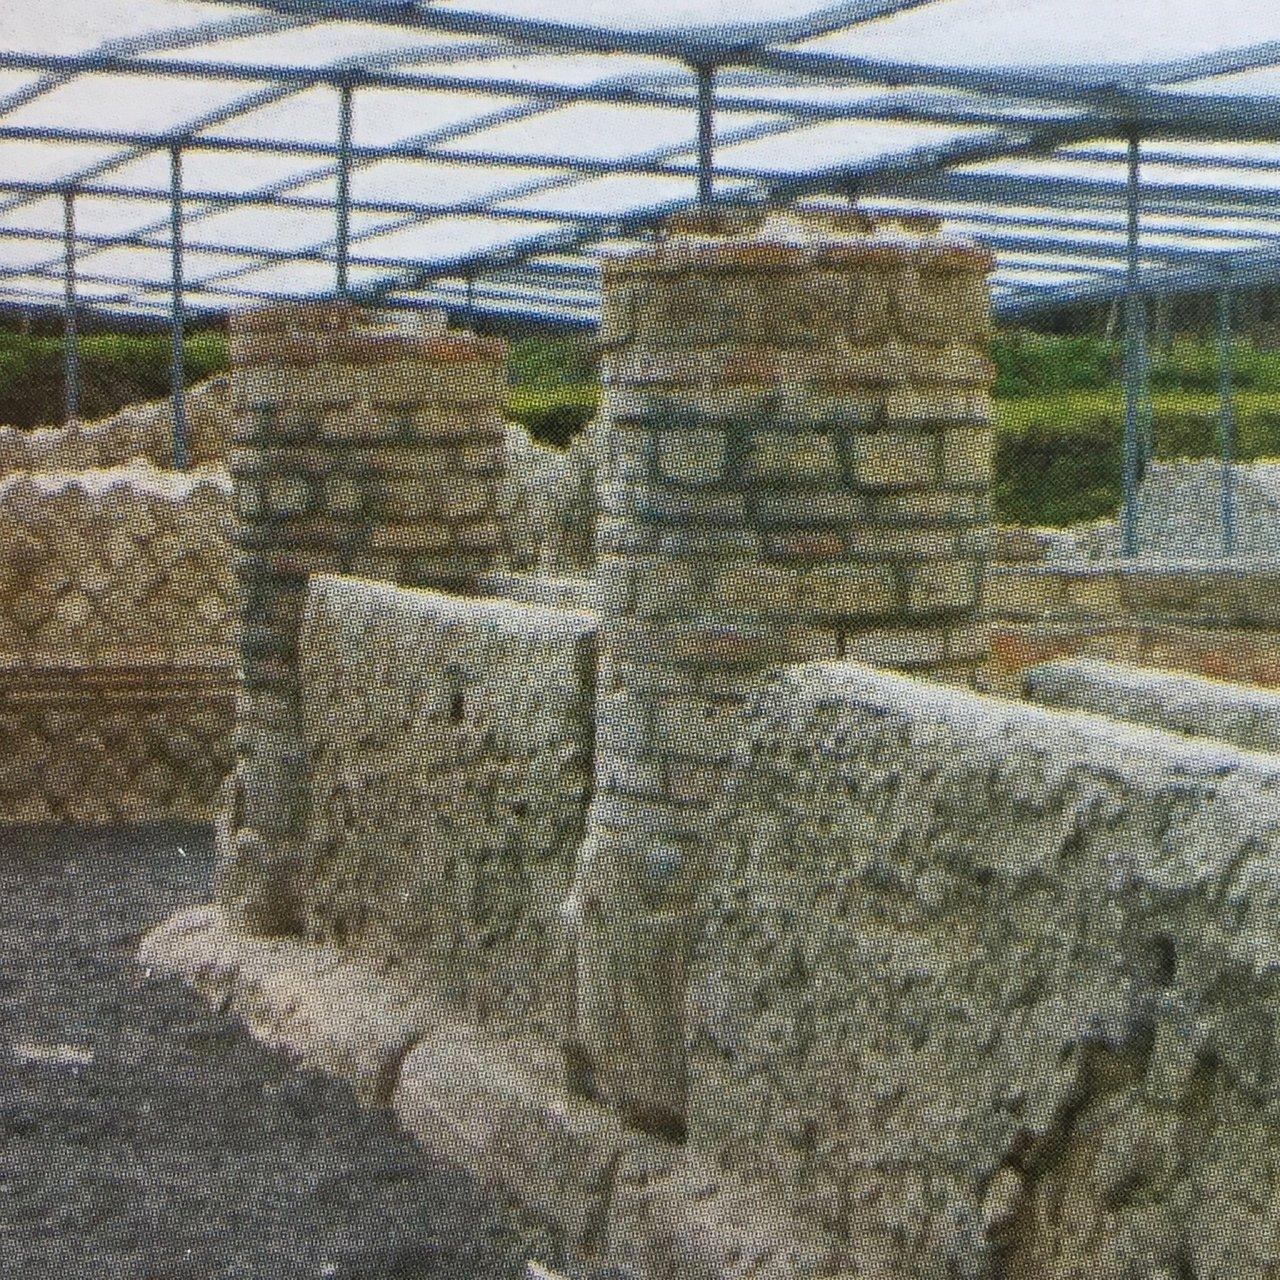 Area archeologica dell'antica Abellinum